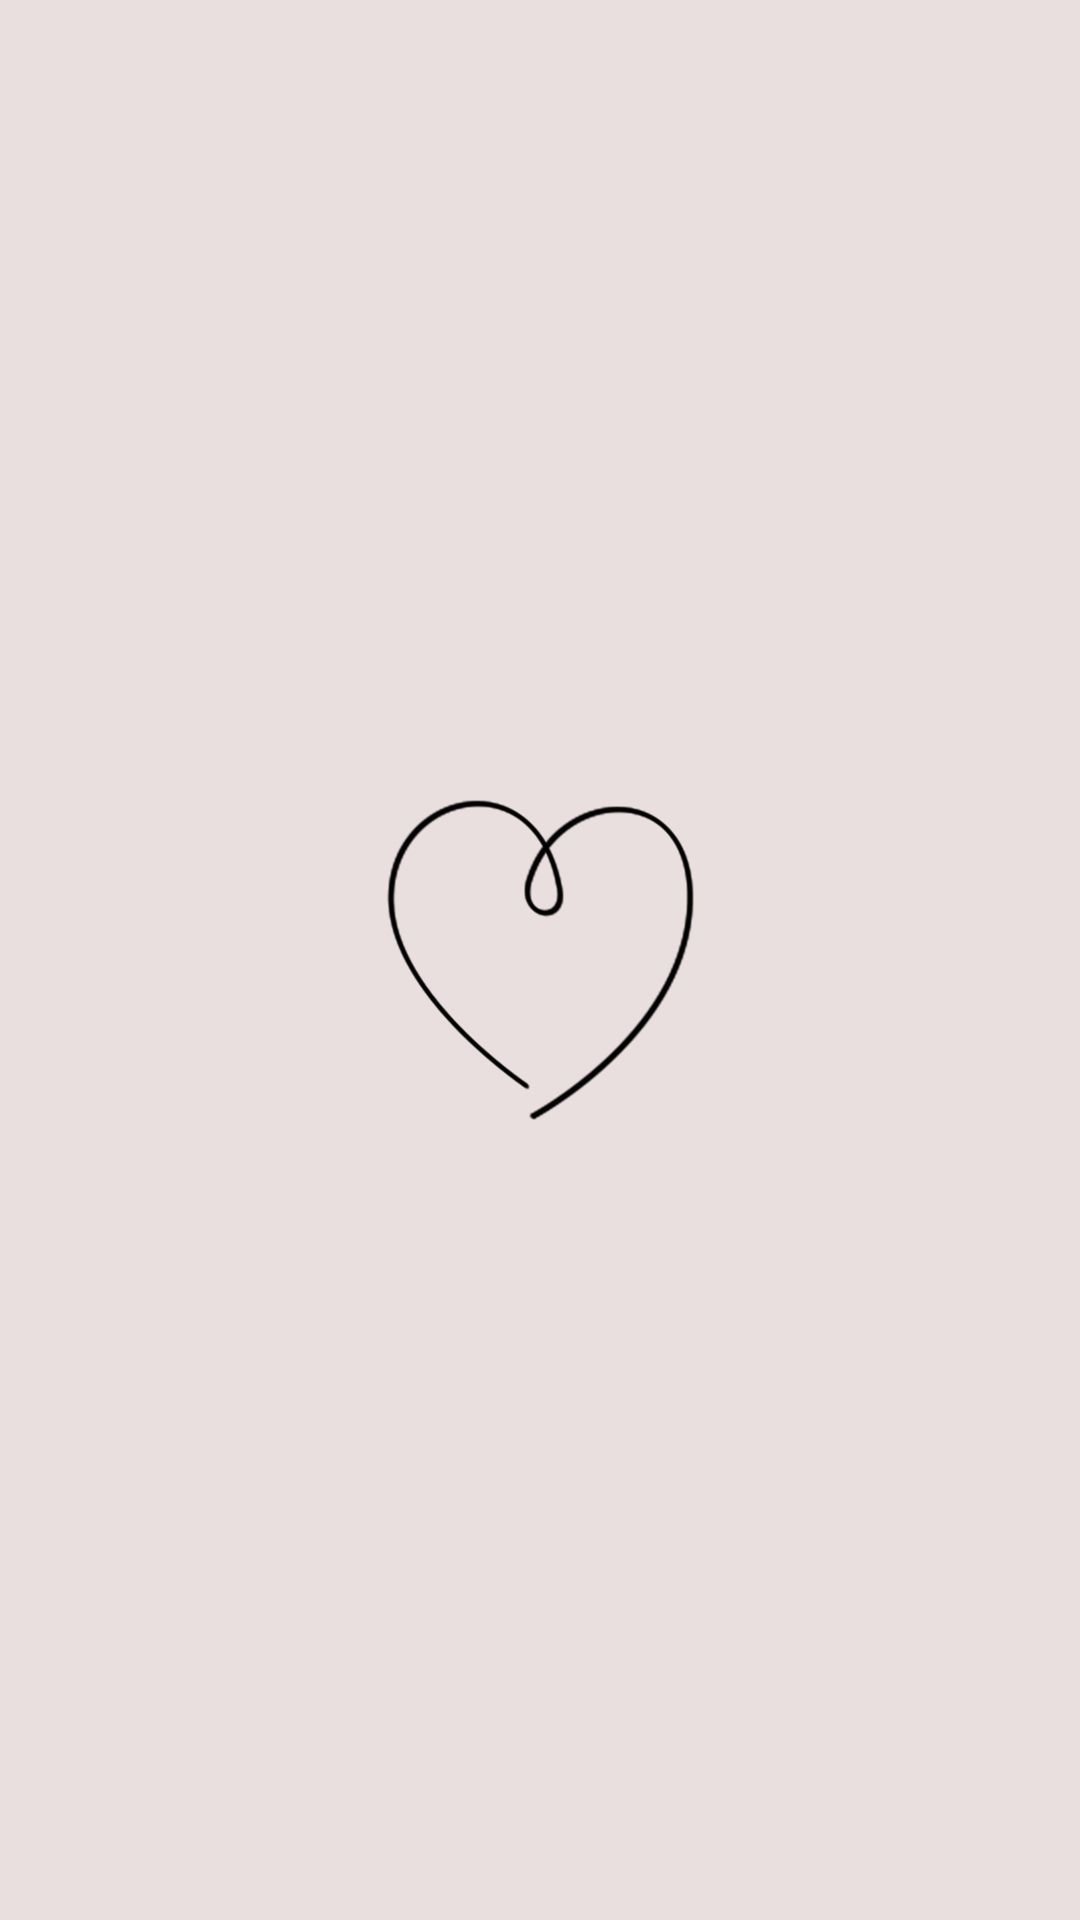 Wallpaper Tumblr Icons Instagram Highlight Cover